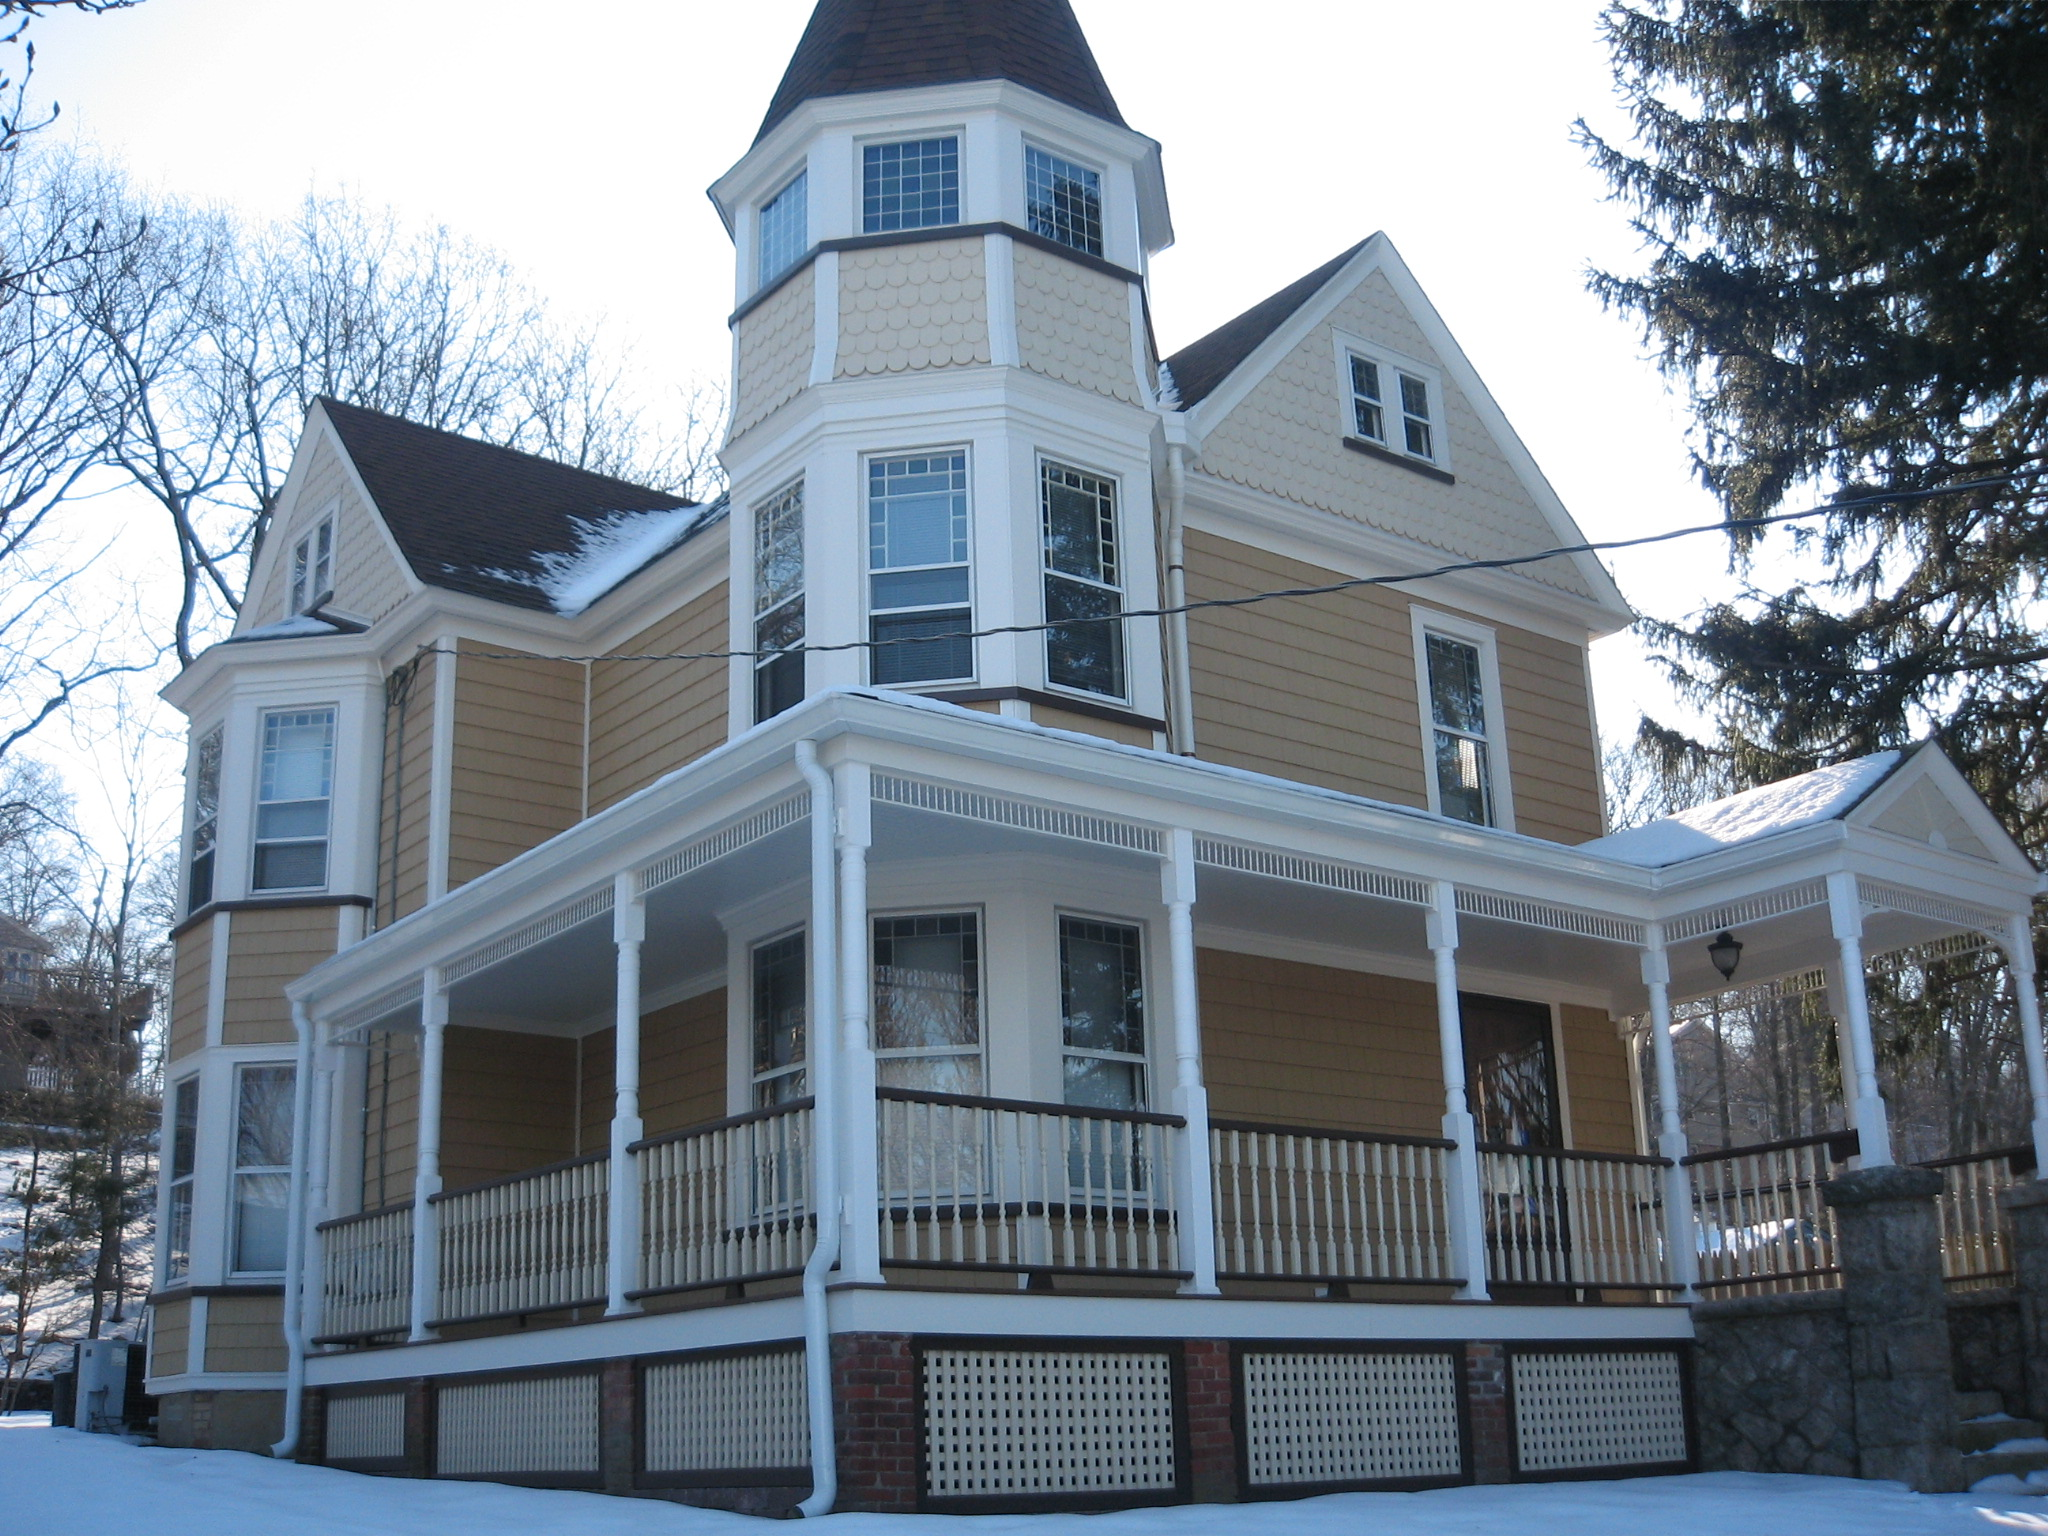 1860s house with vinyl-img_1277.jpg